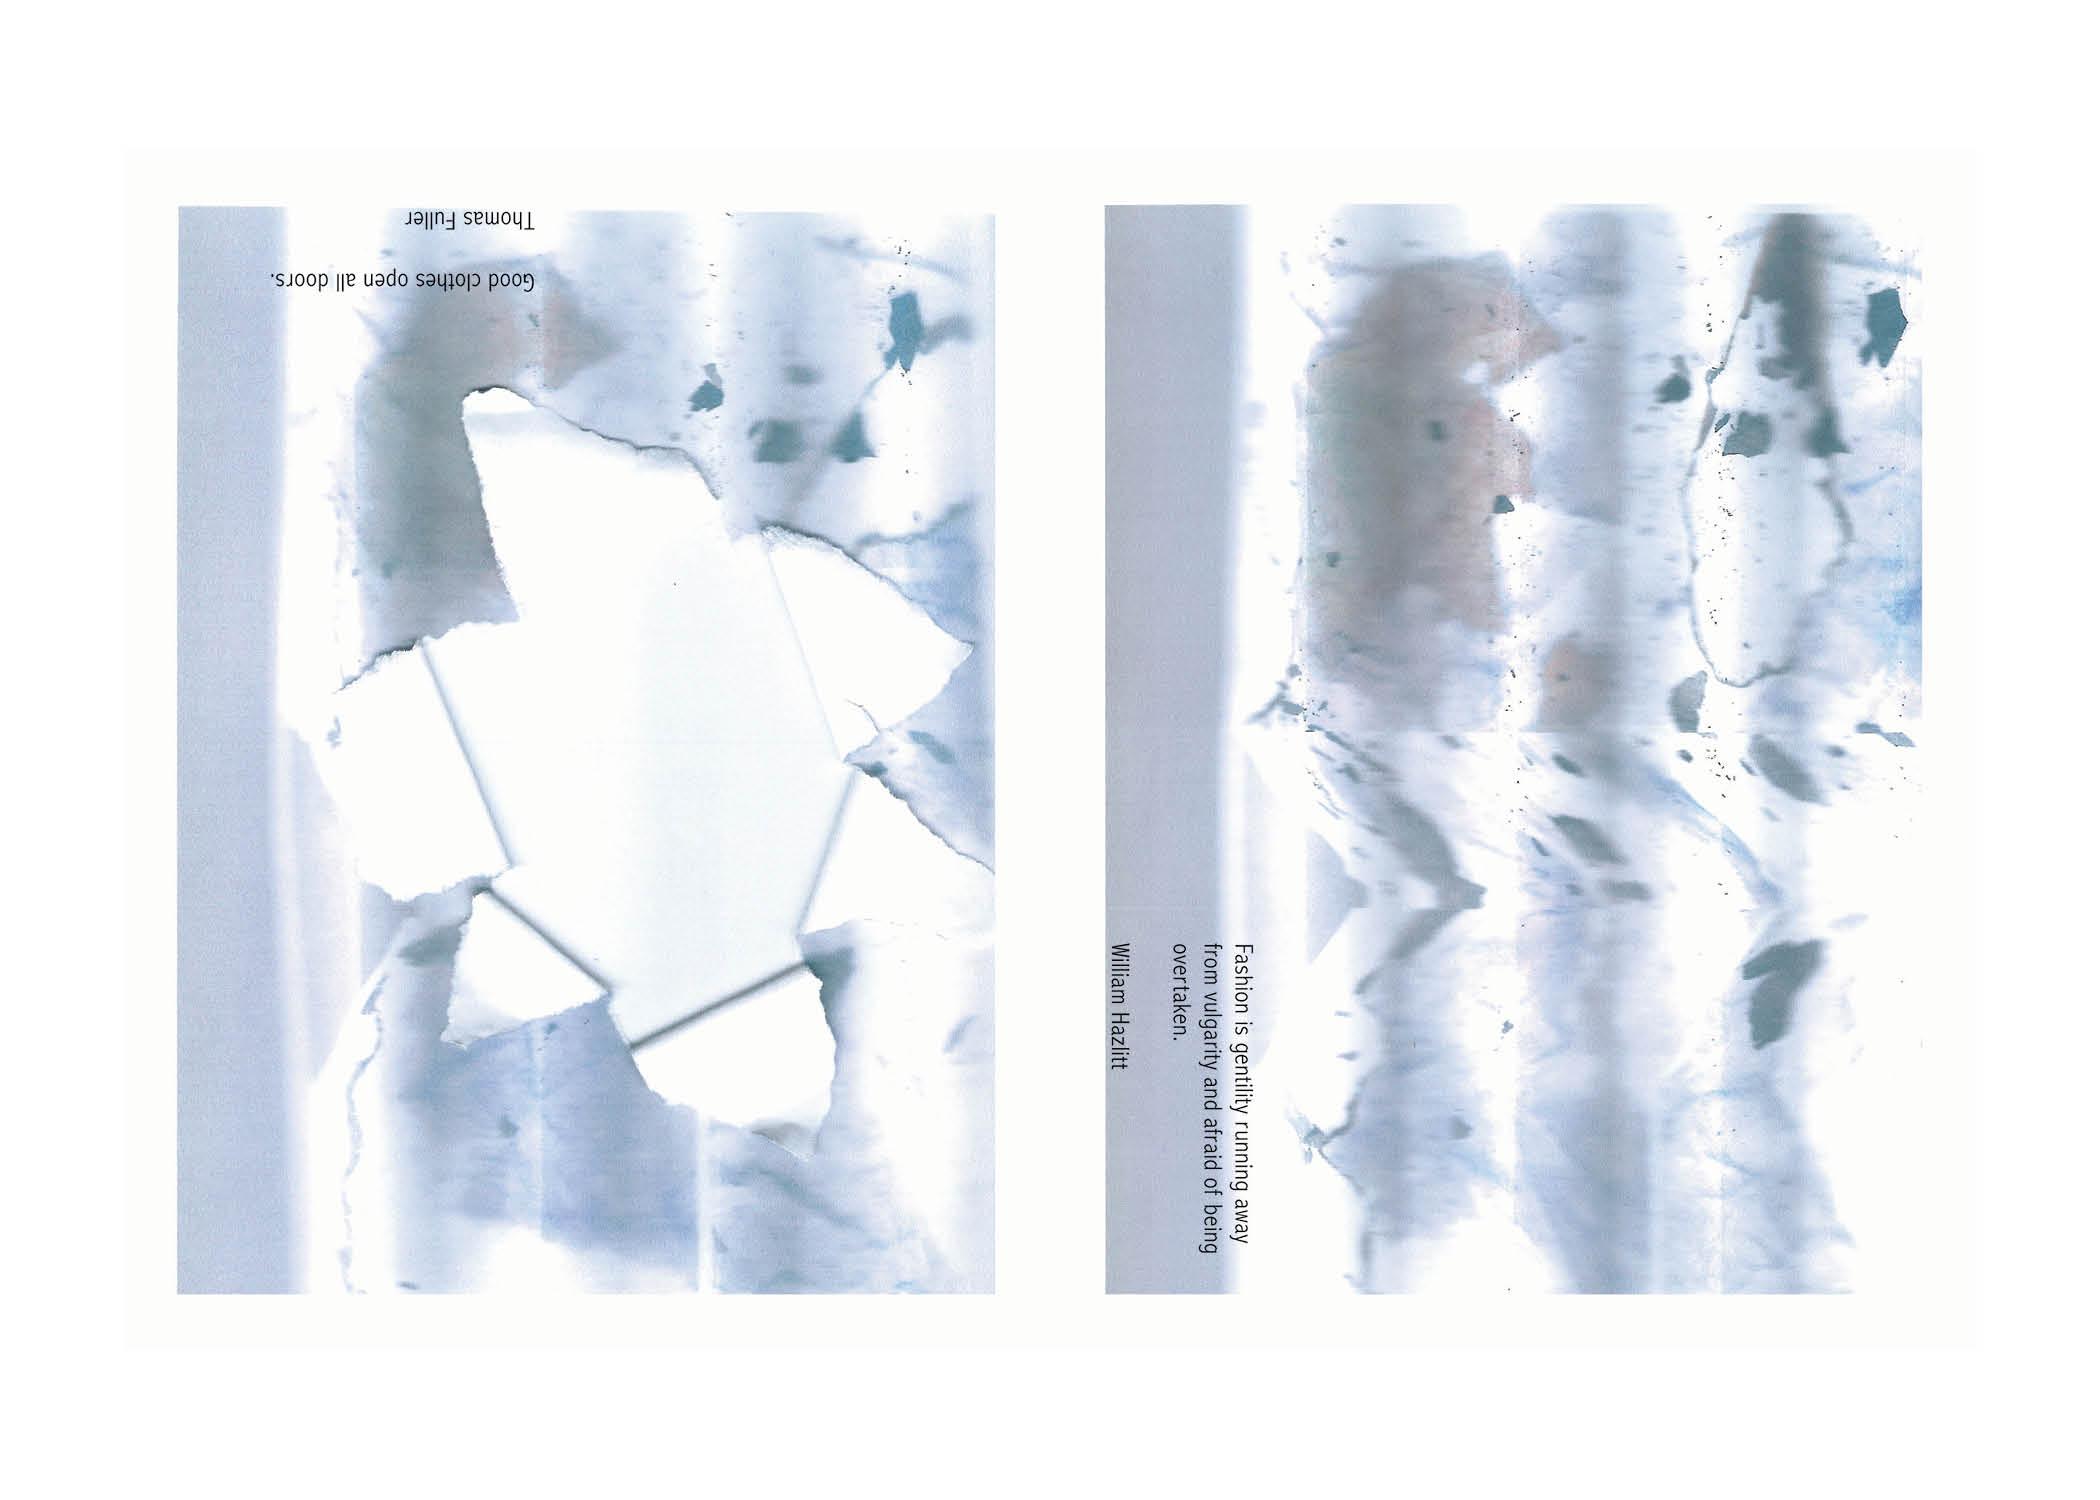 Composition_Distortion3.jpg